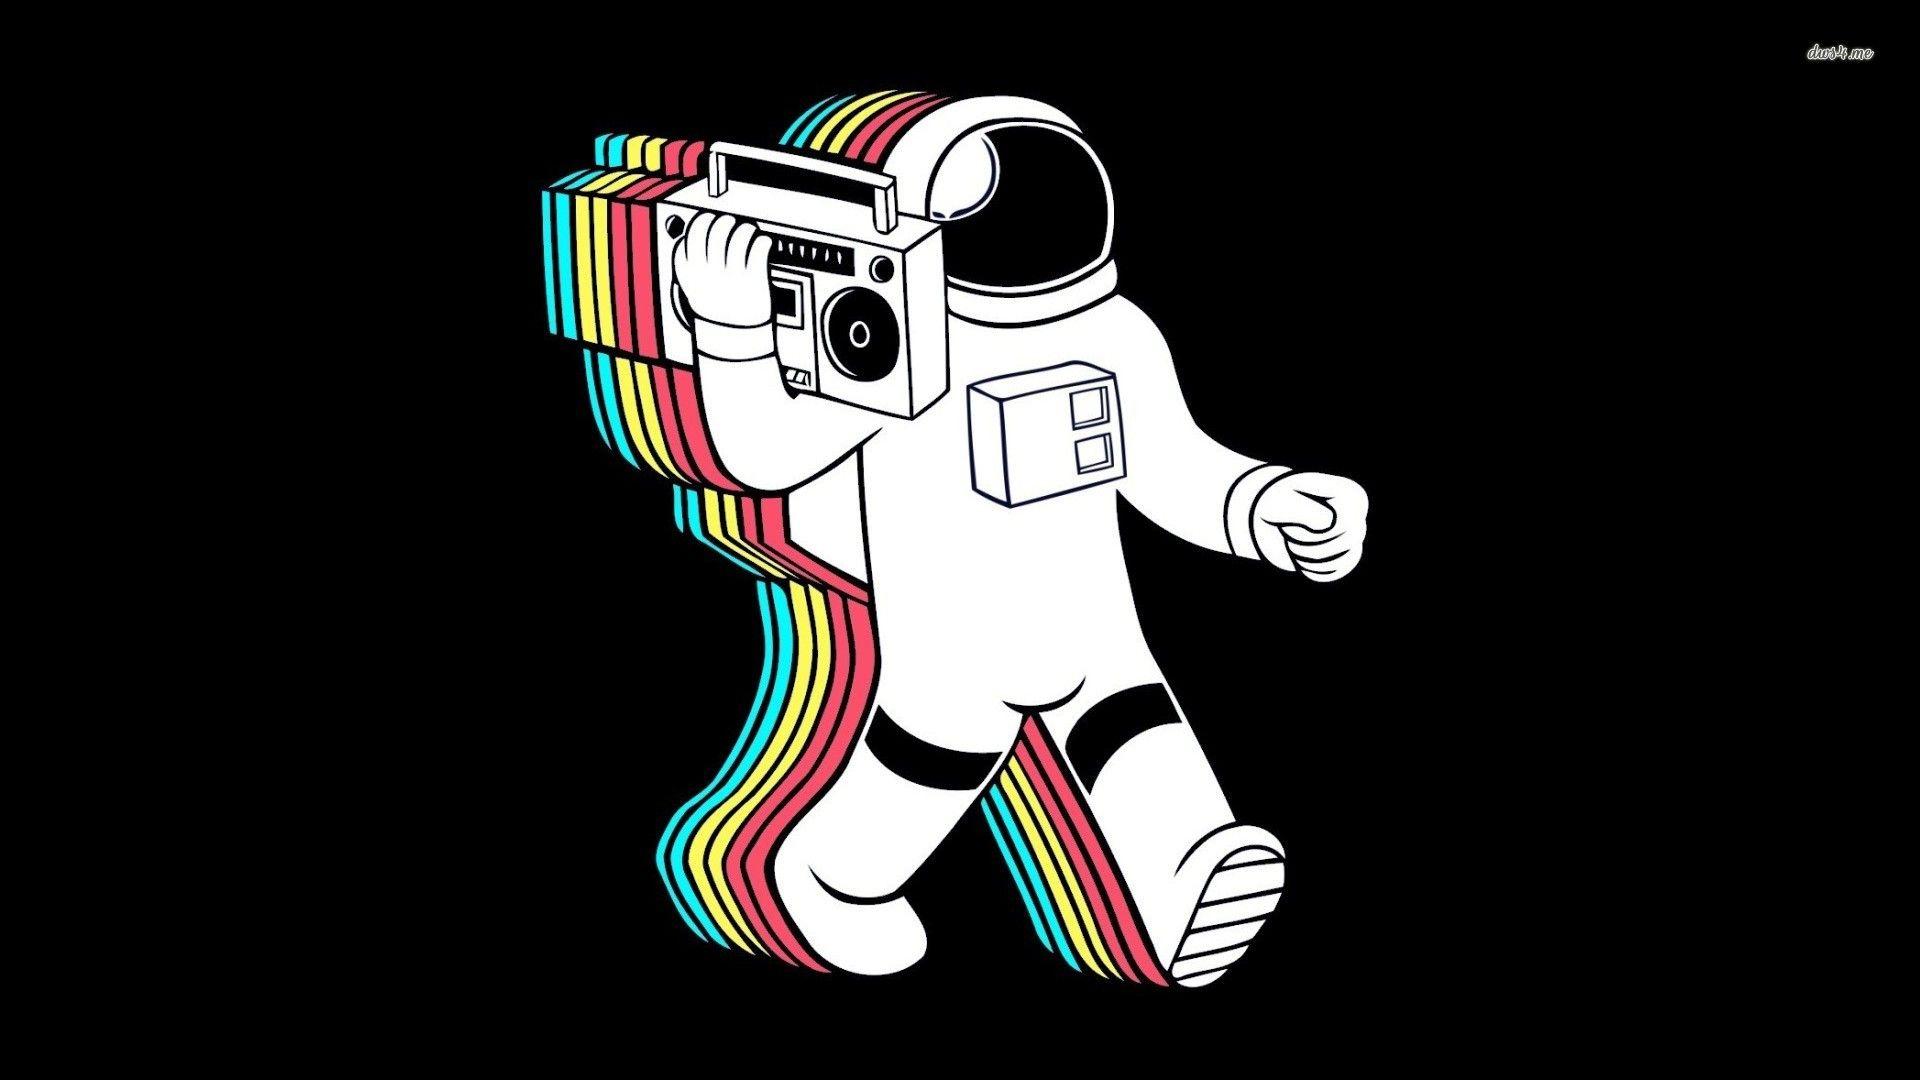 8058 astronaut and boombox 1920 1080 music wallpaper draws